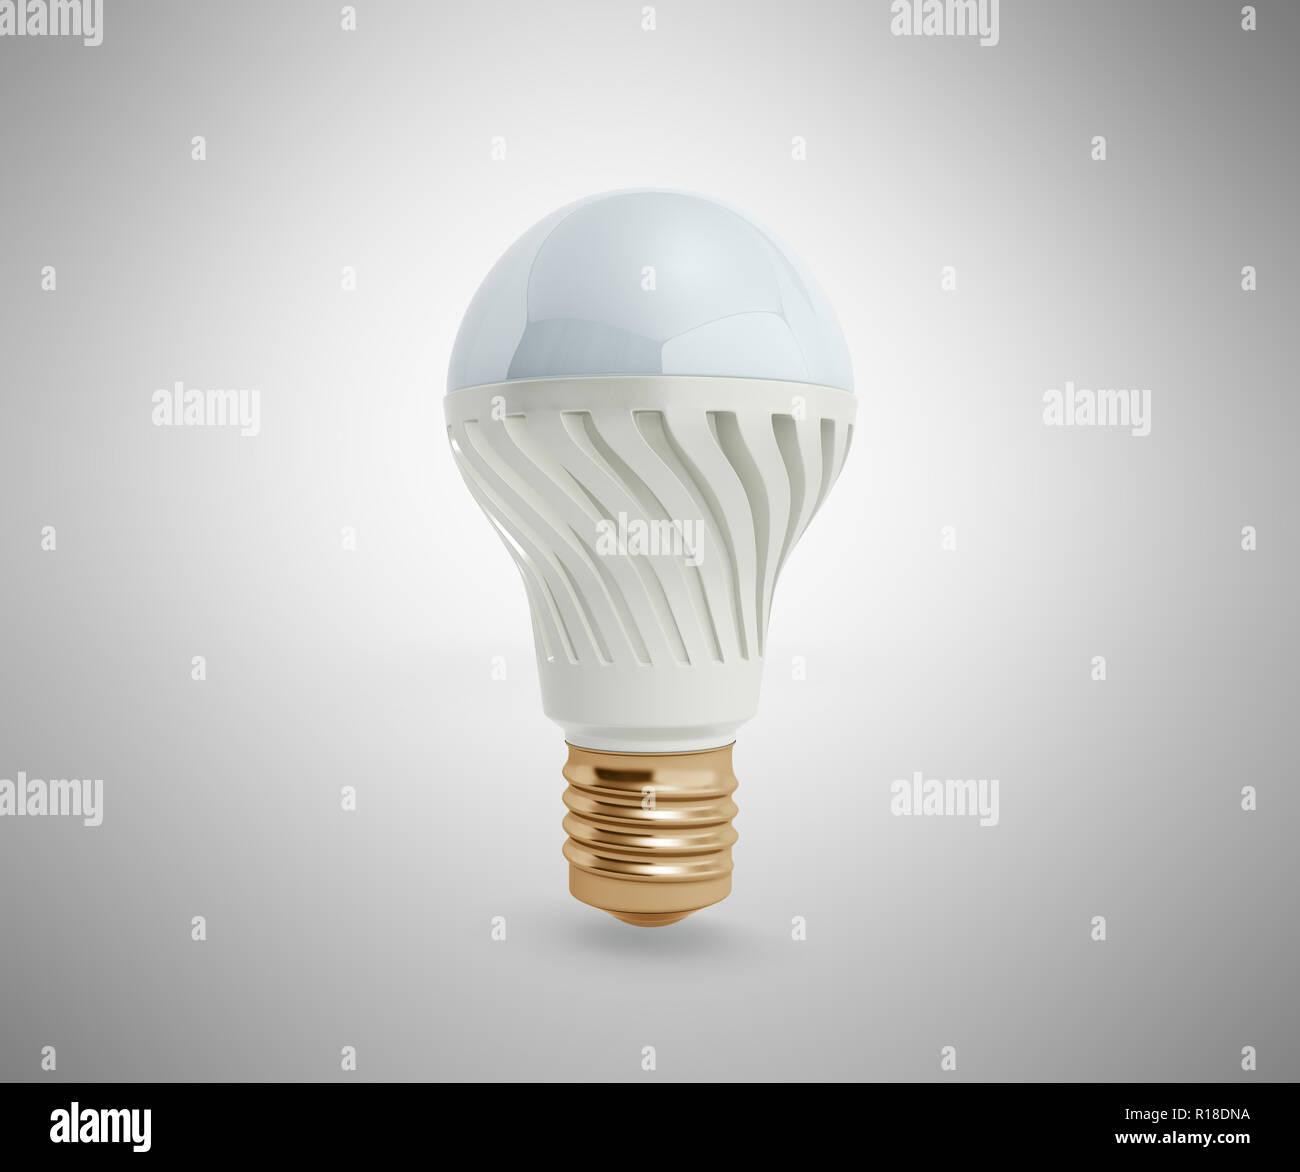 Economy LED lamps isolated on grey background 3d render - Stock Image